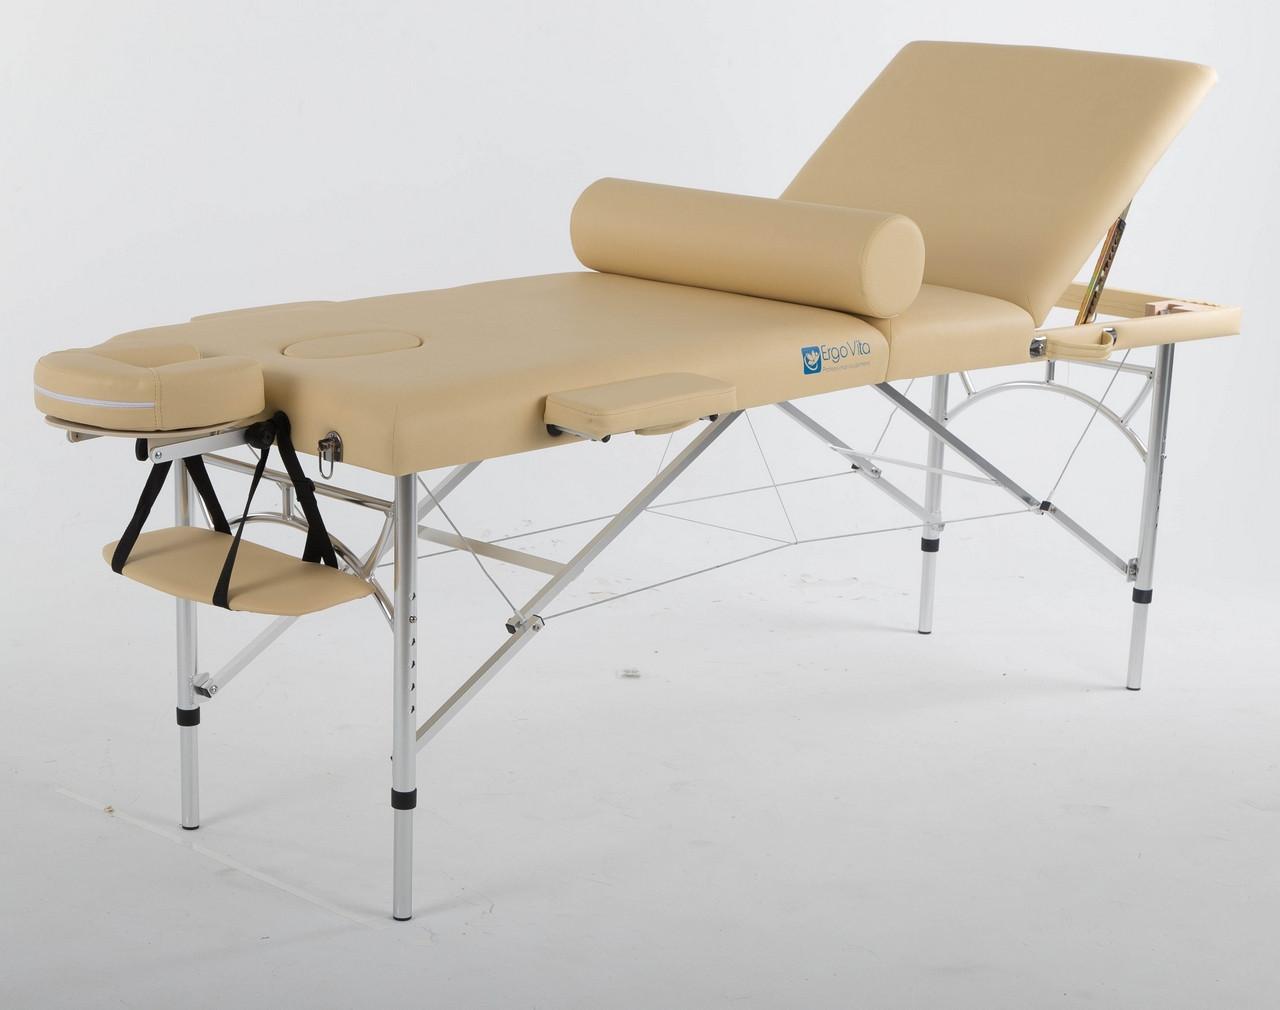 Складной массажный стол ErgoVita Master Alu Plus (бежевый)